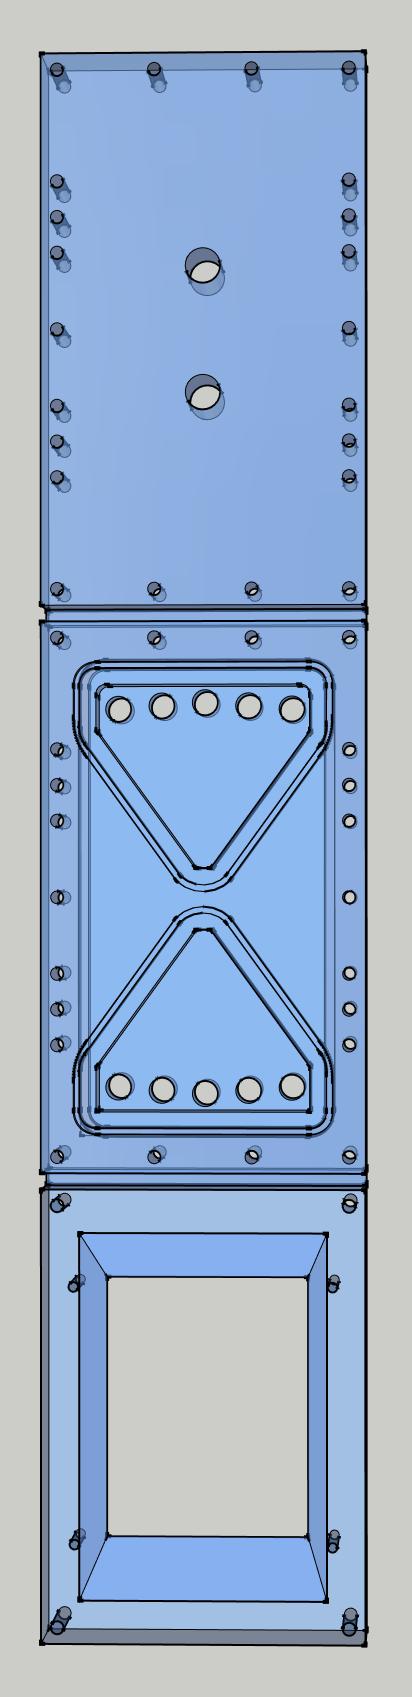 perspex_design_by_crabid-d3k6ooz.png